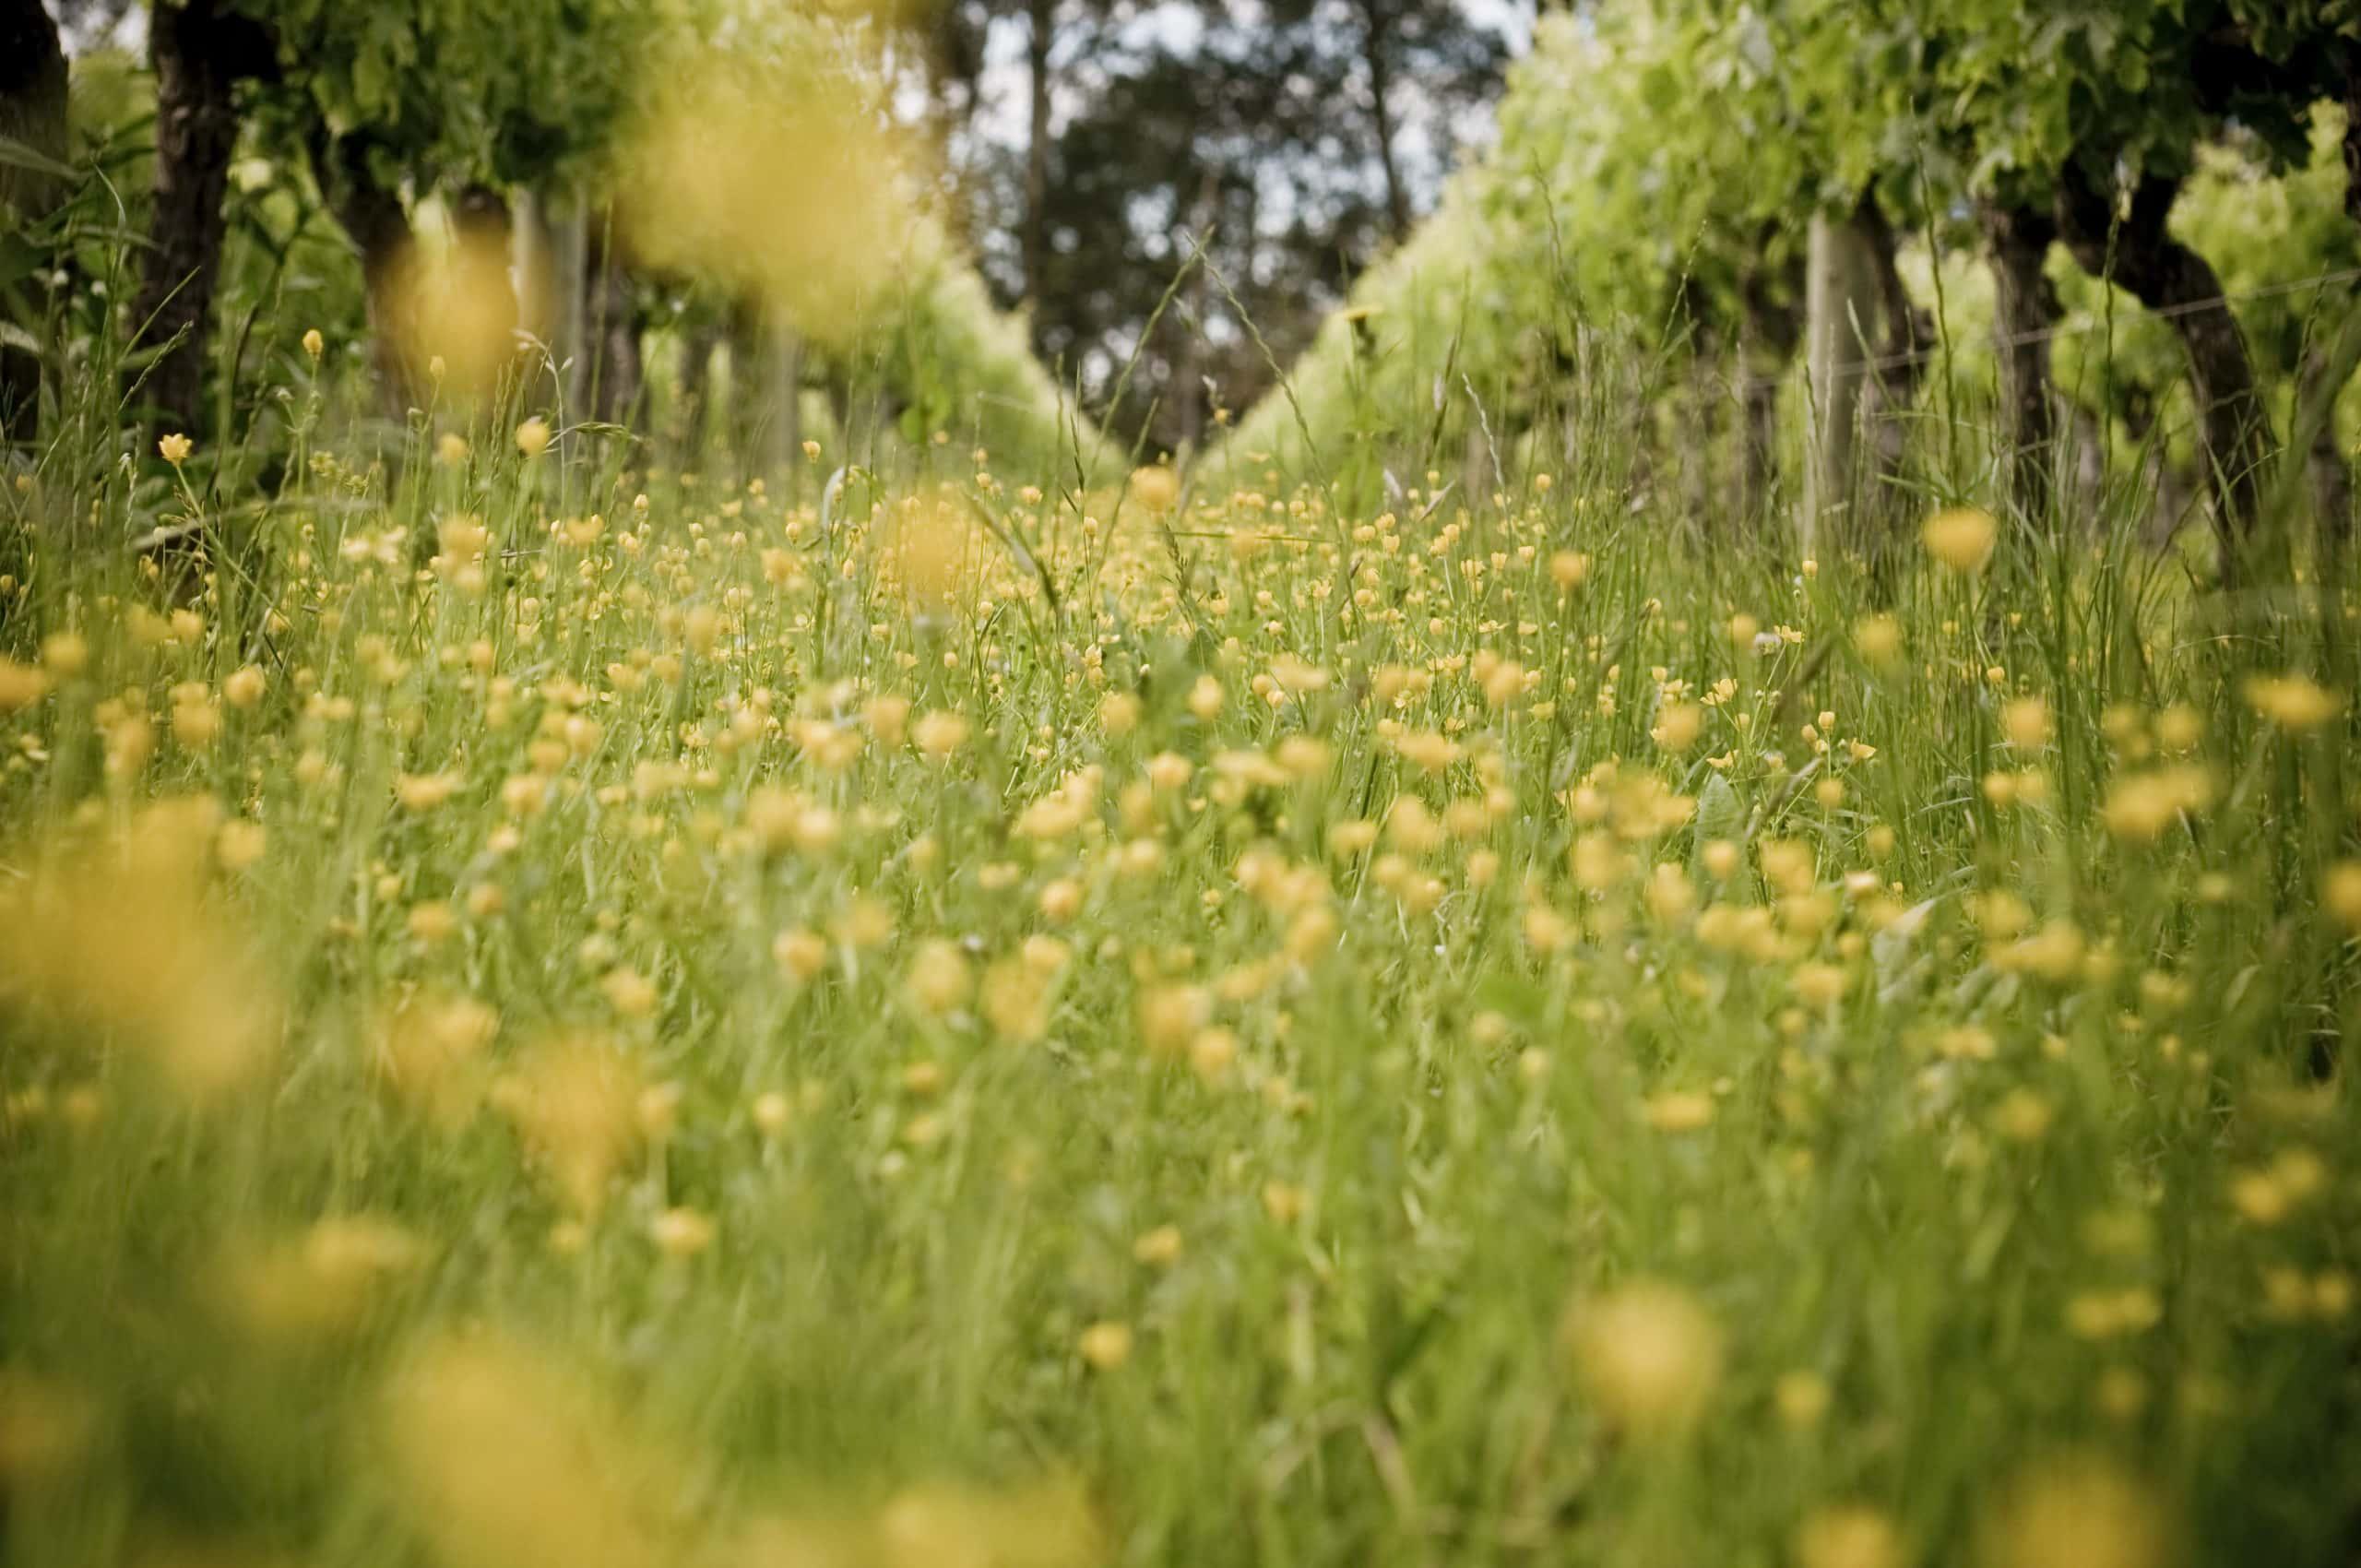 Vineyard Ecosystems